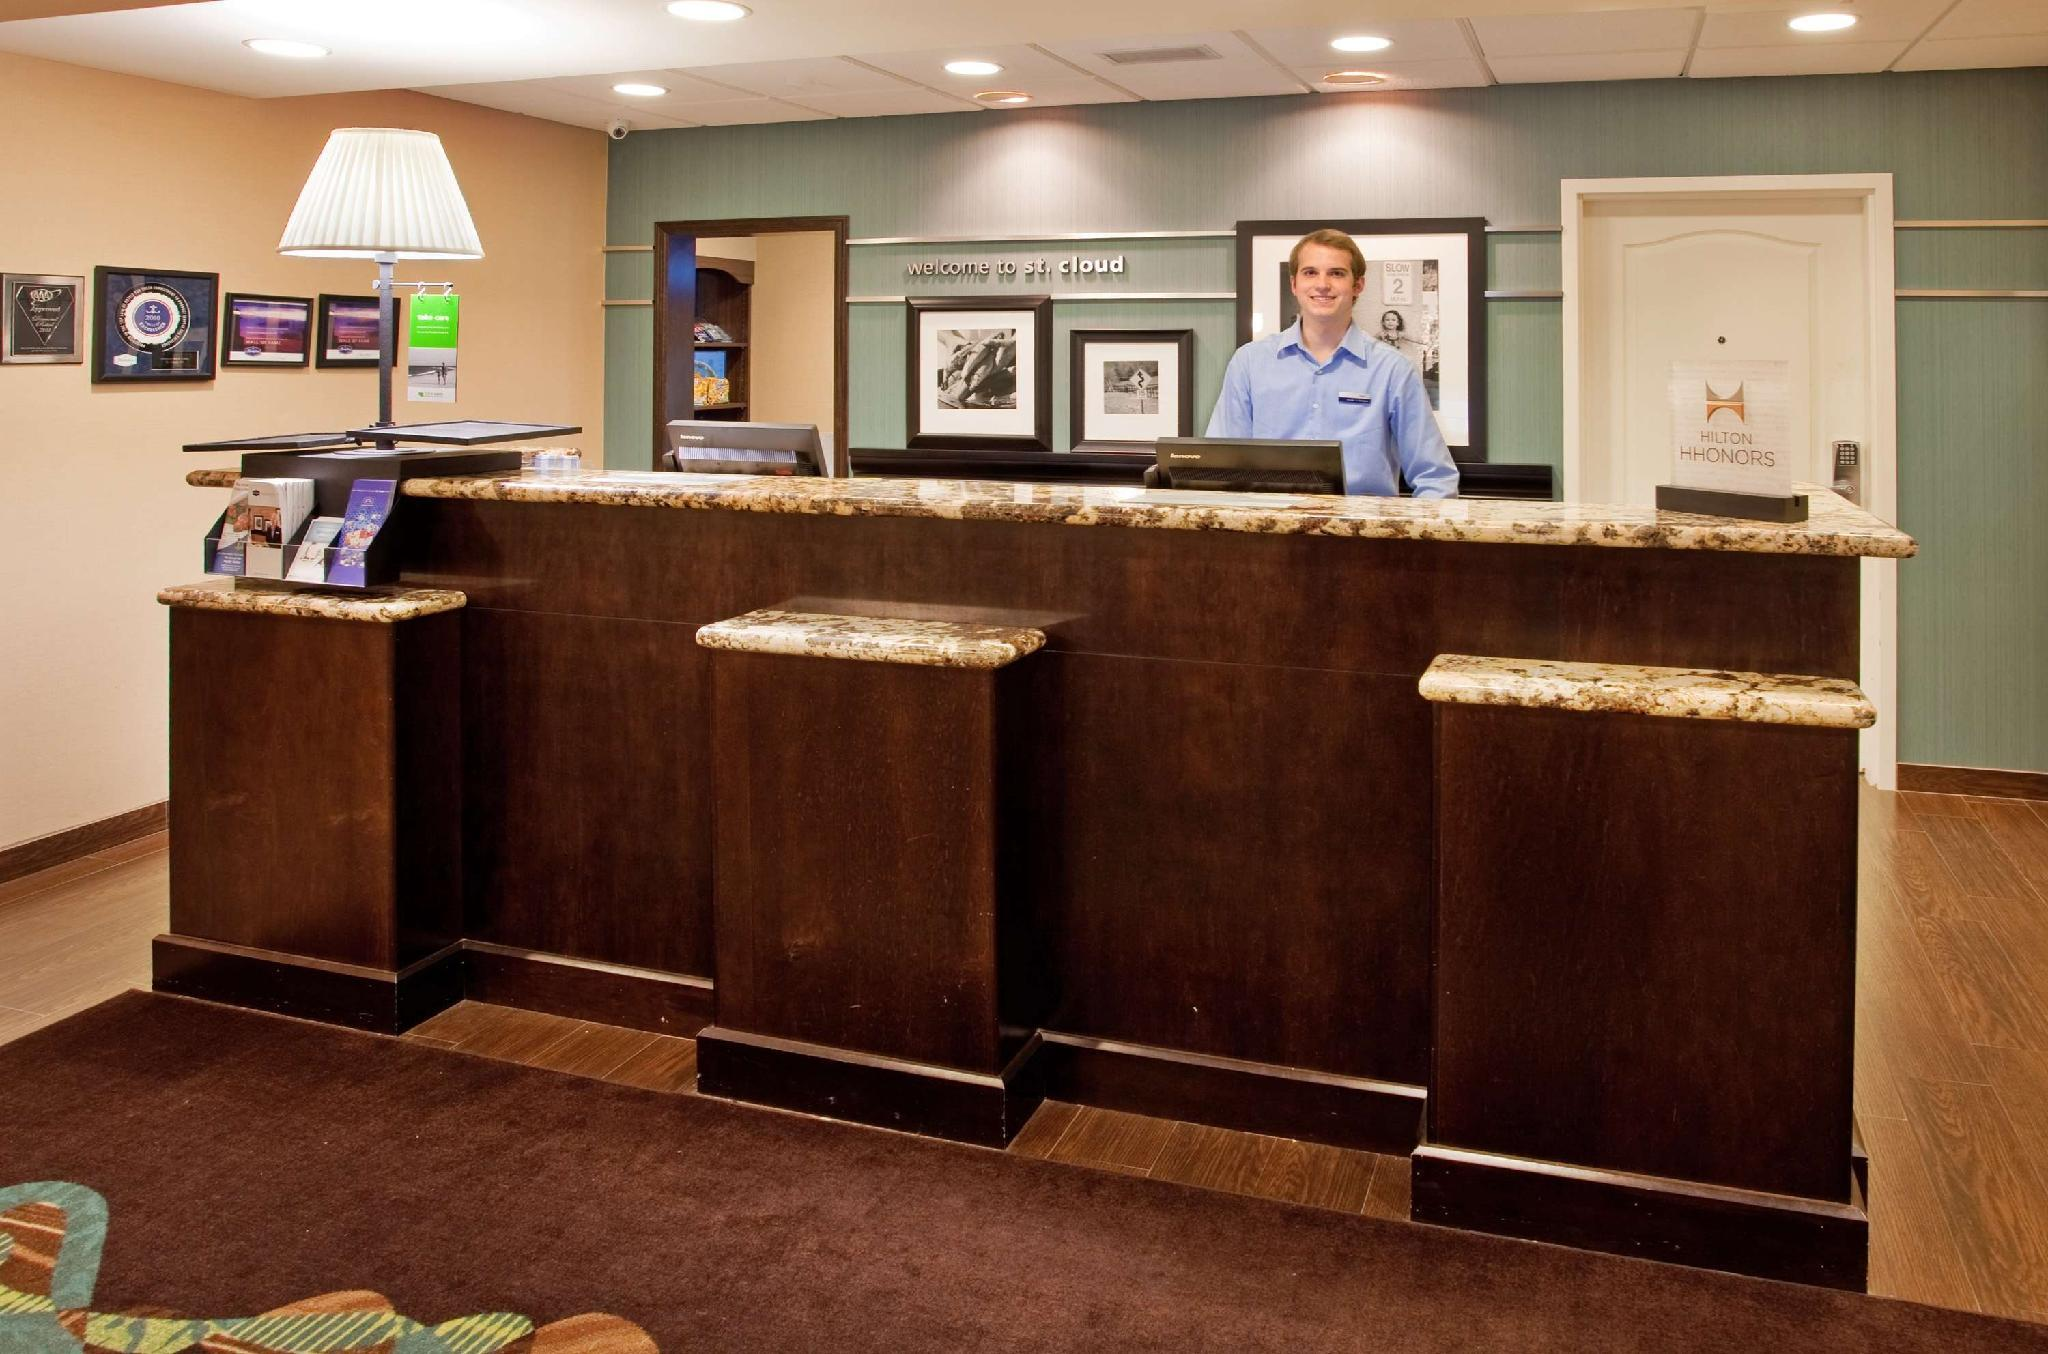 Hampton Inn And Suites St. Cloud